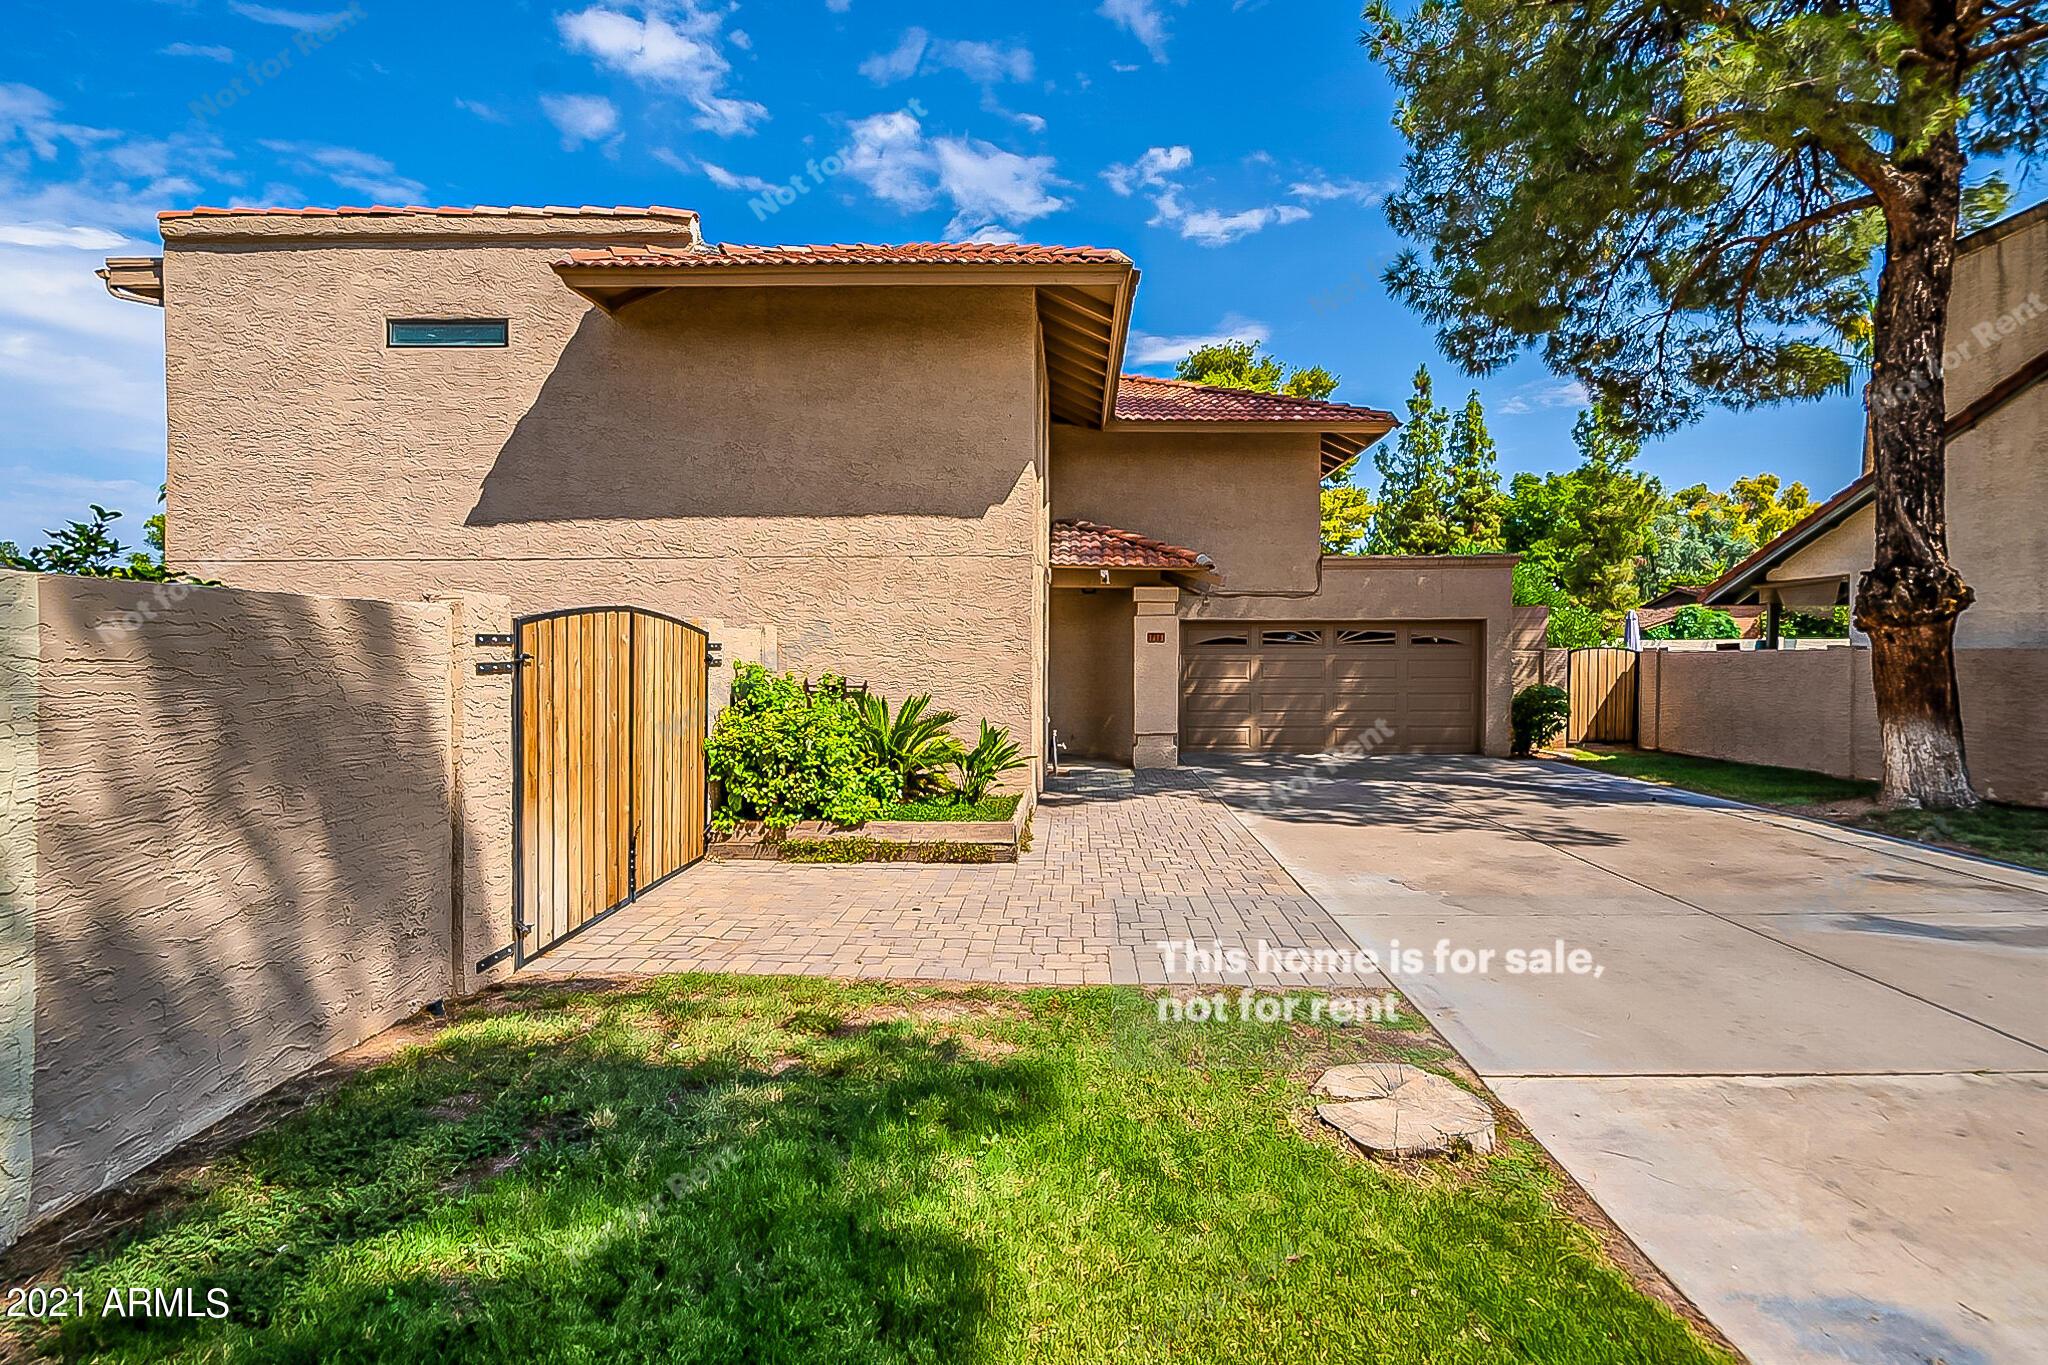 MLS 6296350 713 N LARKSPUR Street, Gilbert, AZ 85234 Gilbert AZ Breckenridge Manor